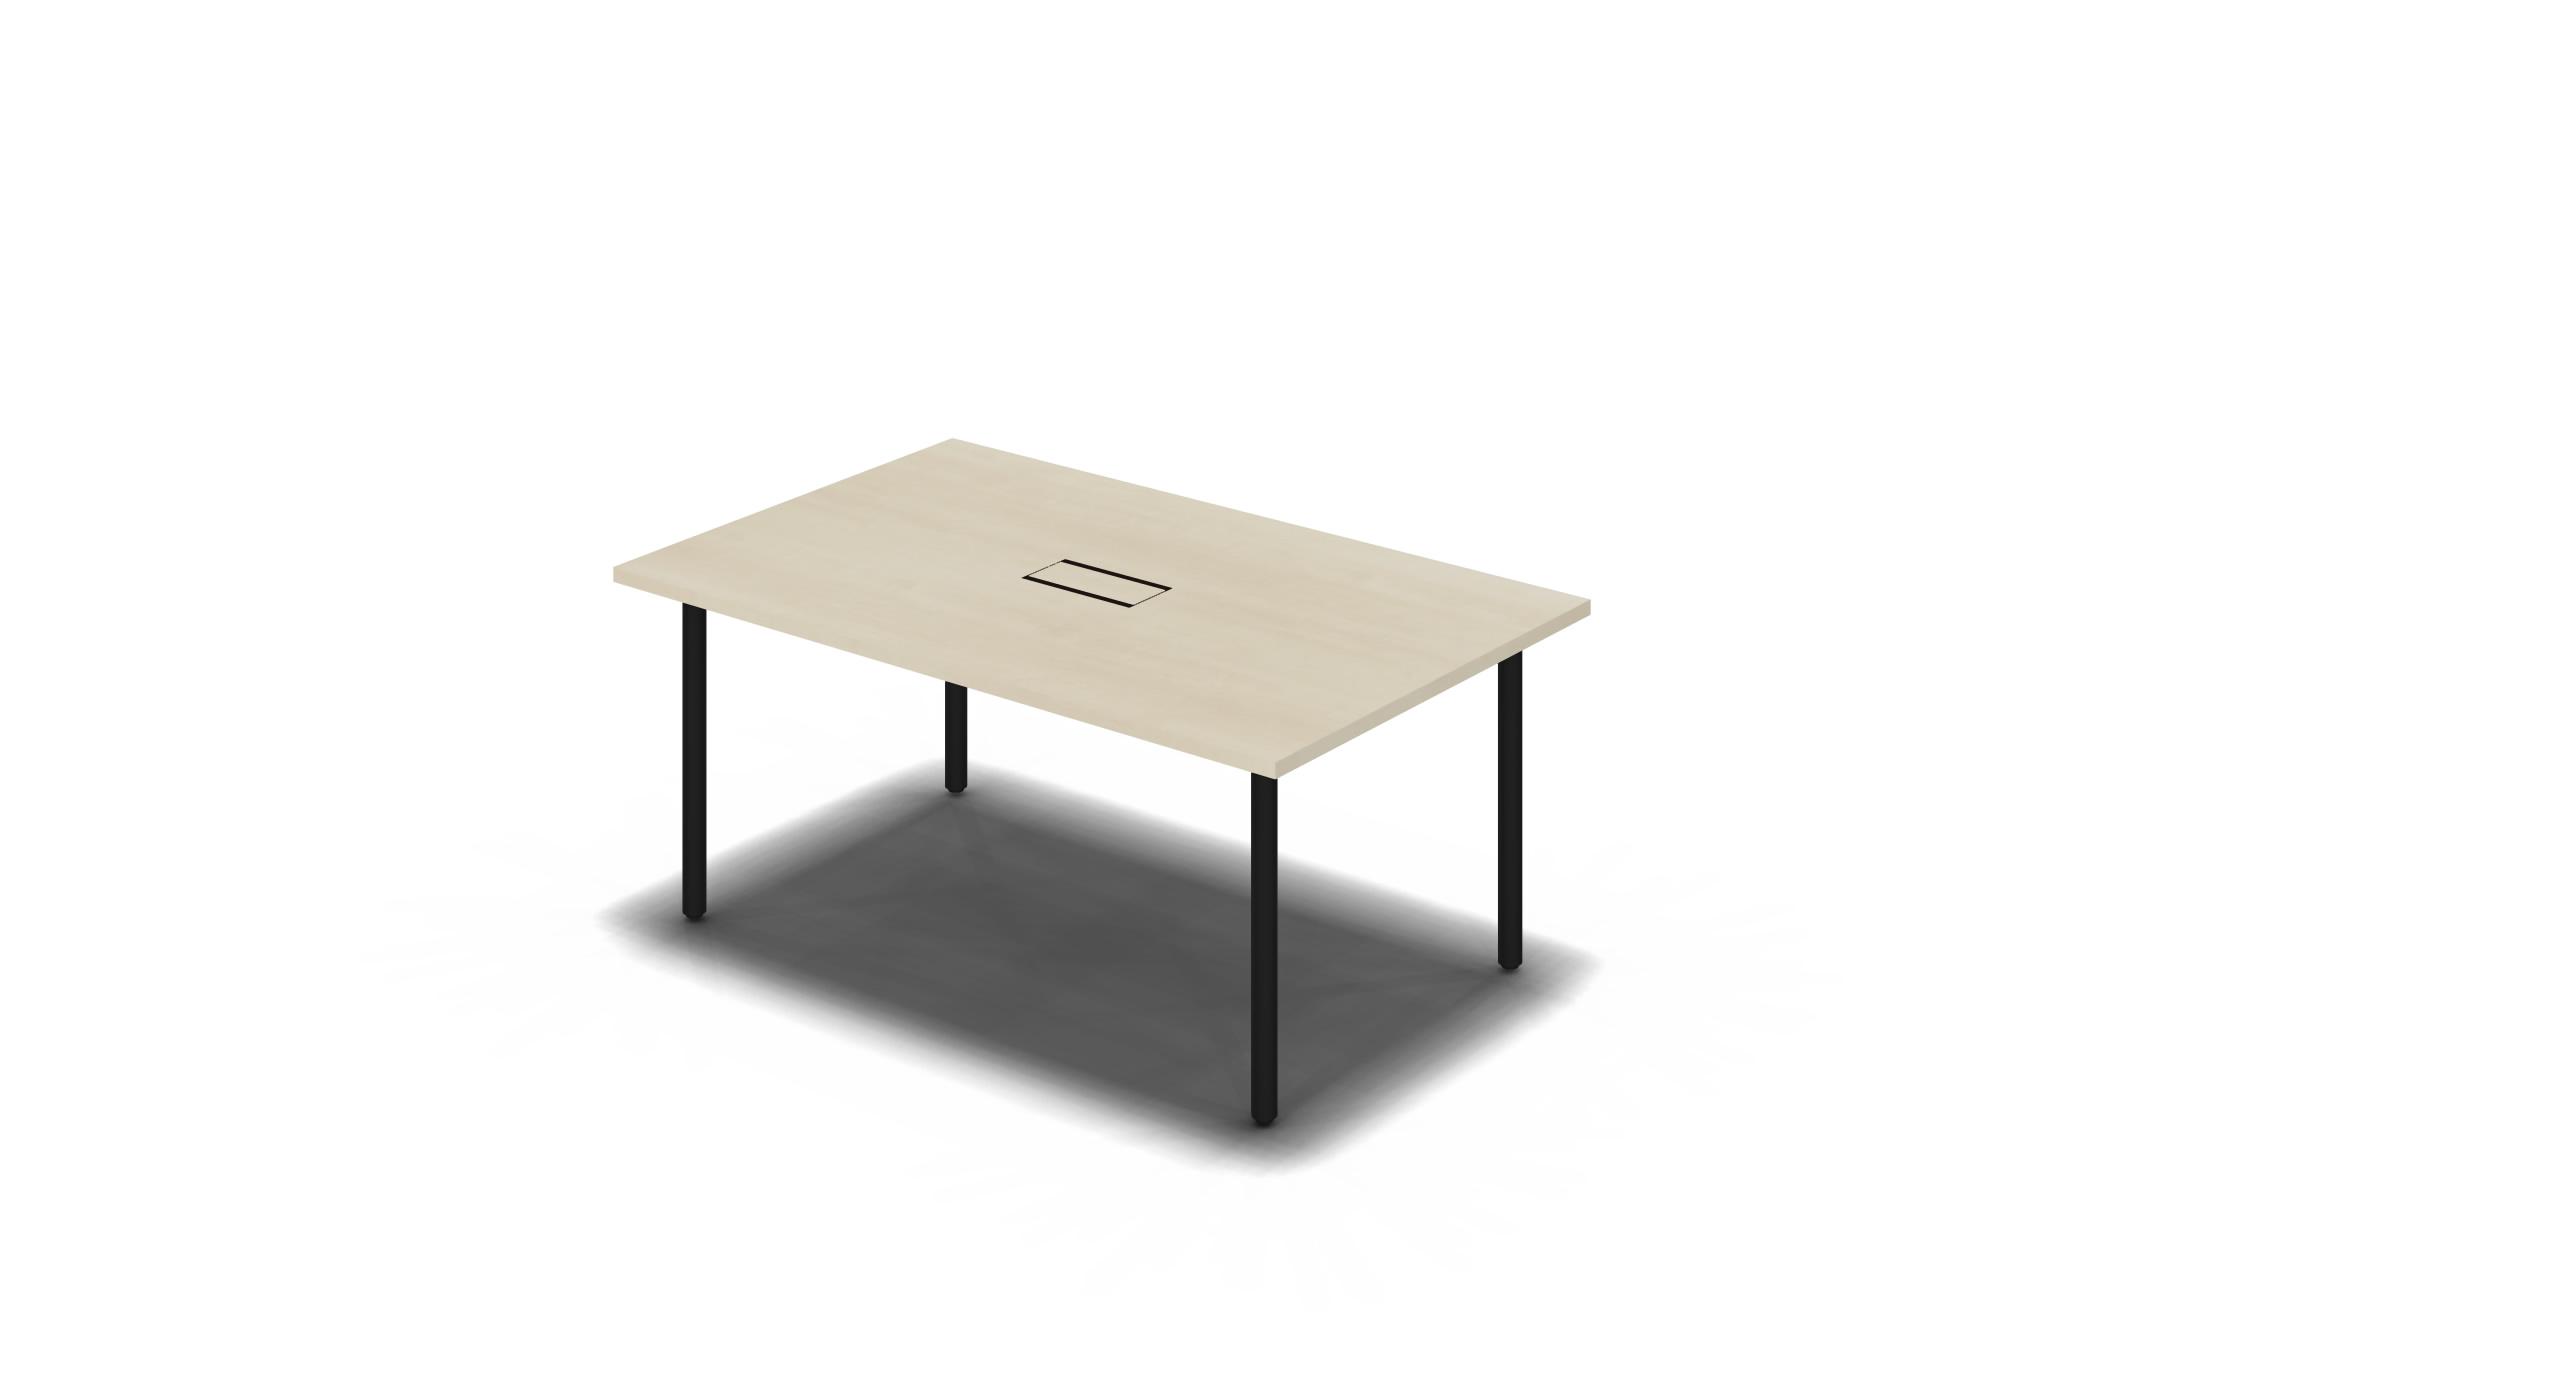 Table_Round_1500x900_Black_Maple_withOption